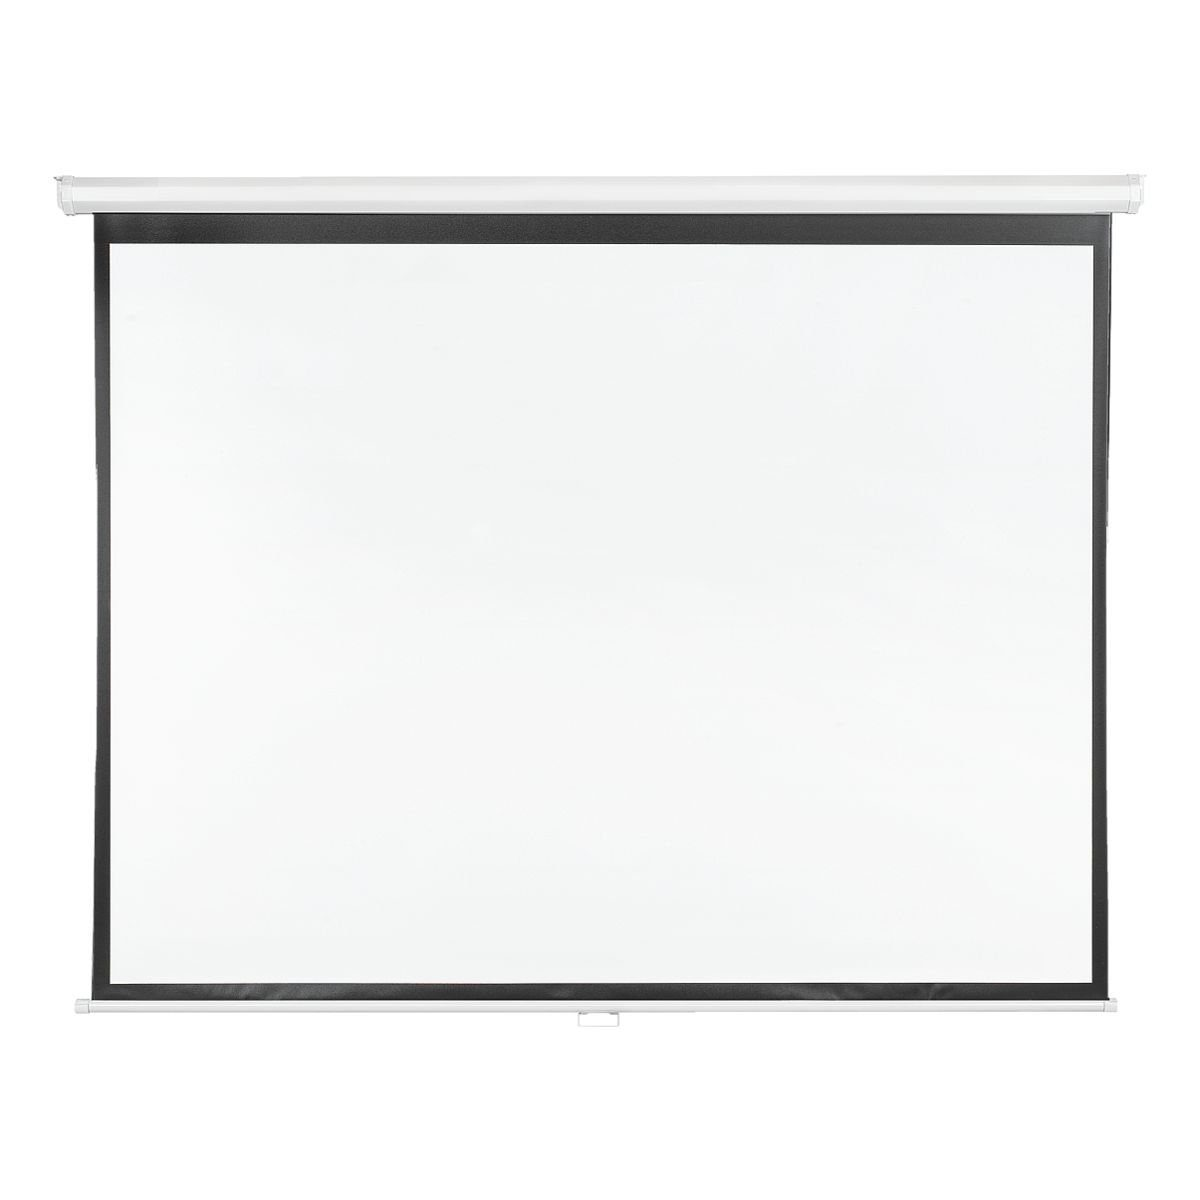 FRANKEN Rollo-Leinwand 180x135 cm »X-tra! Line«